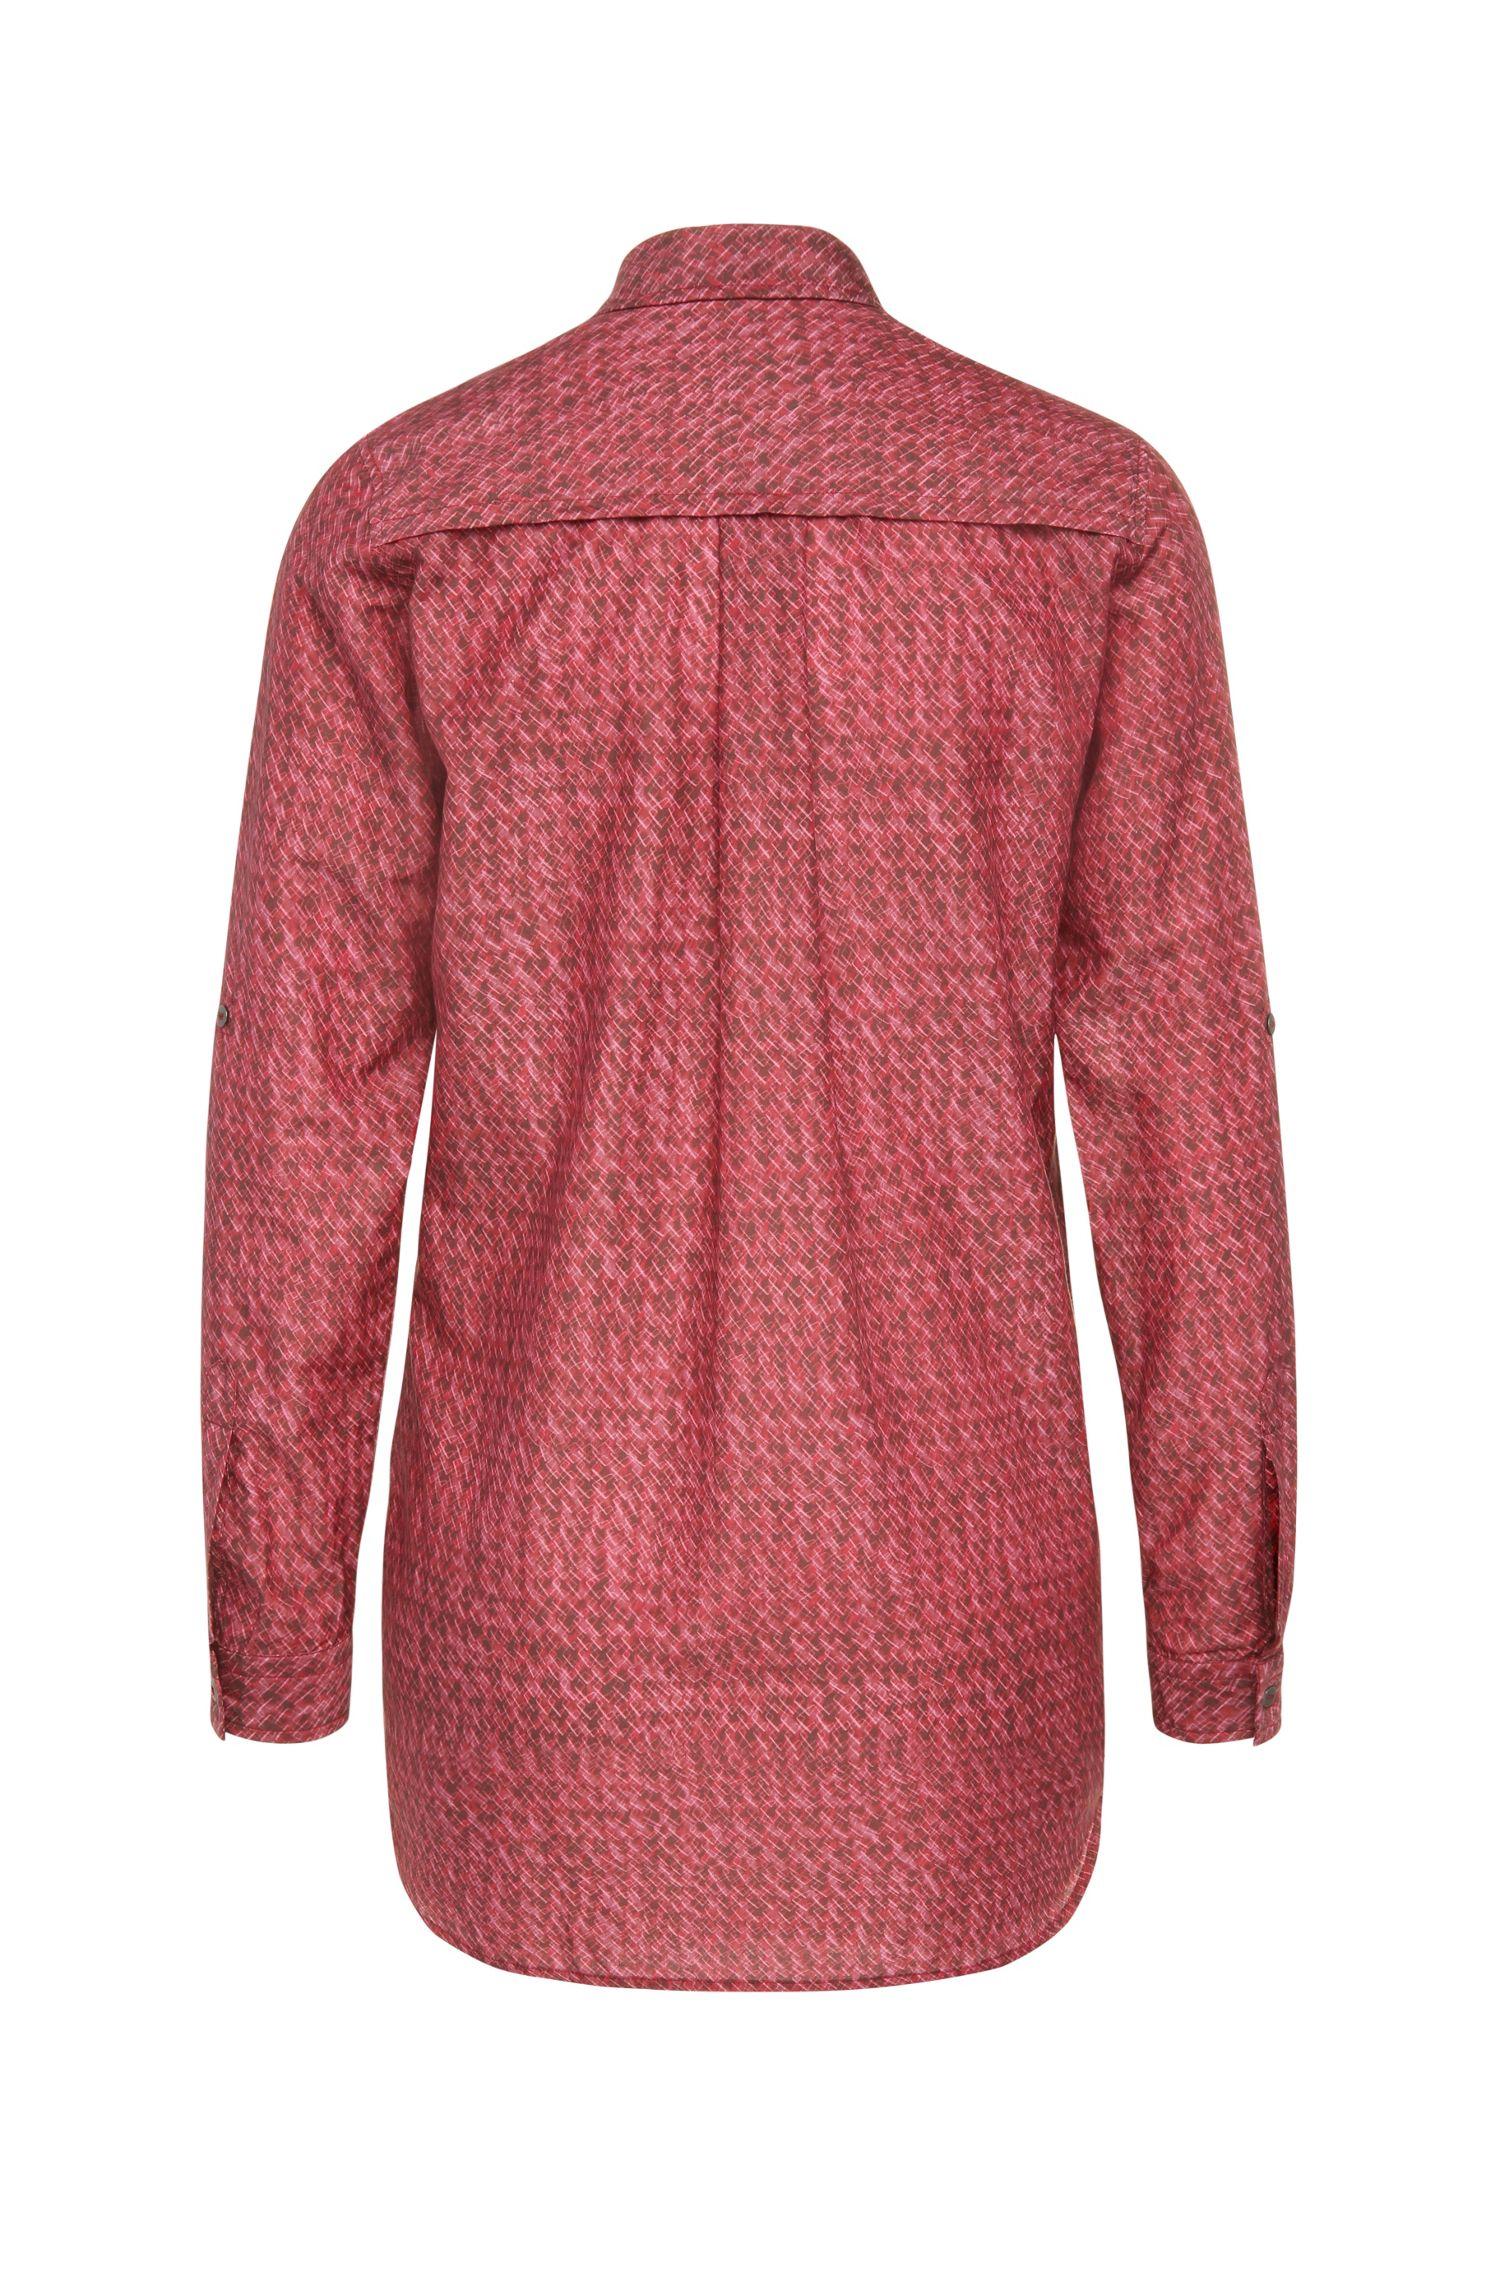 Gemusterte Relaxed-Fit Bluse aus Baumwoll-Mix mit Seide: ´Chrisler_2`